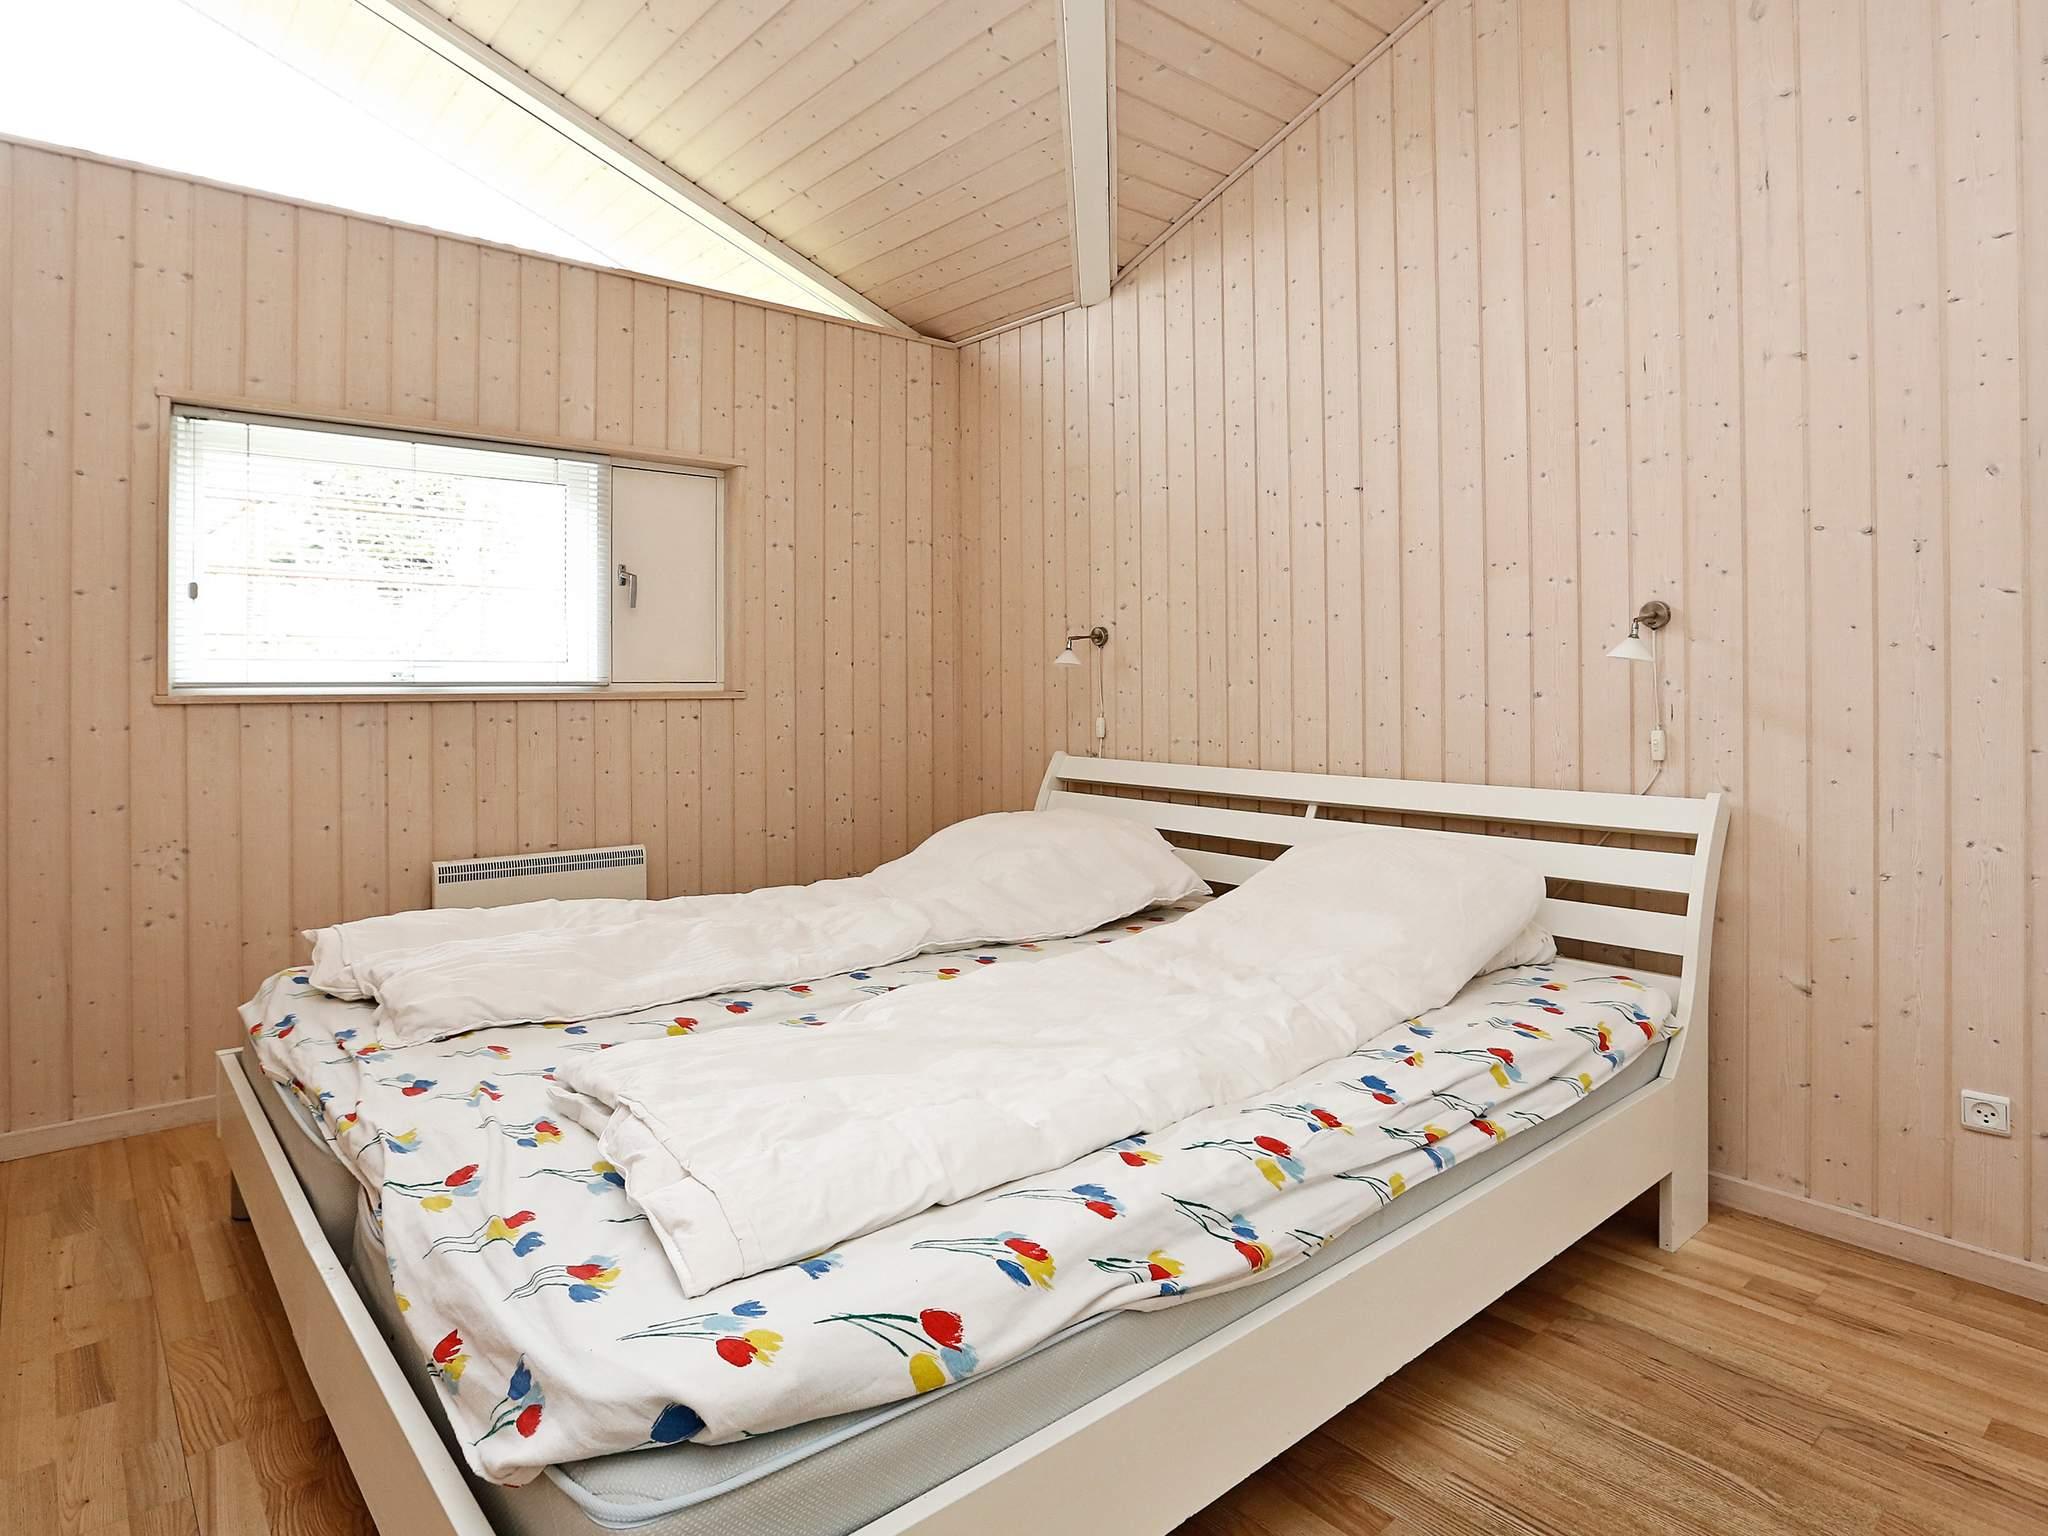 Maison de vacances Skibby (124927), Kirke Hyllinge, , Seeland Nord, Danemark, image 10